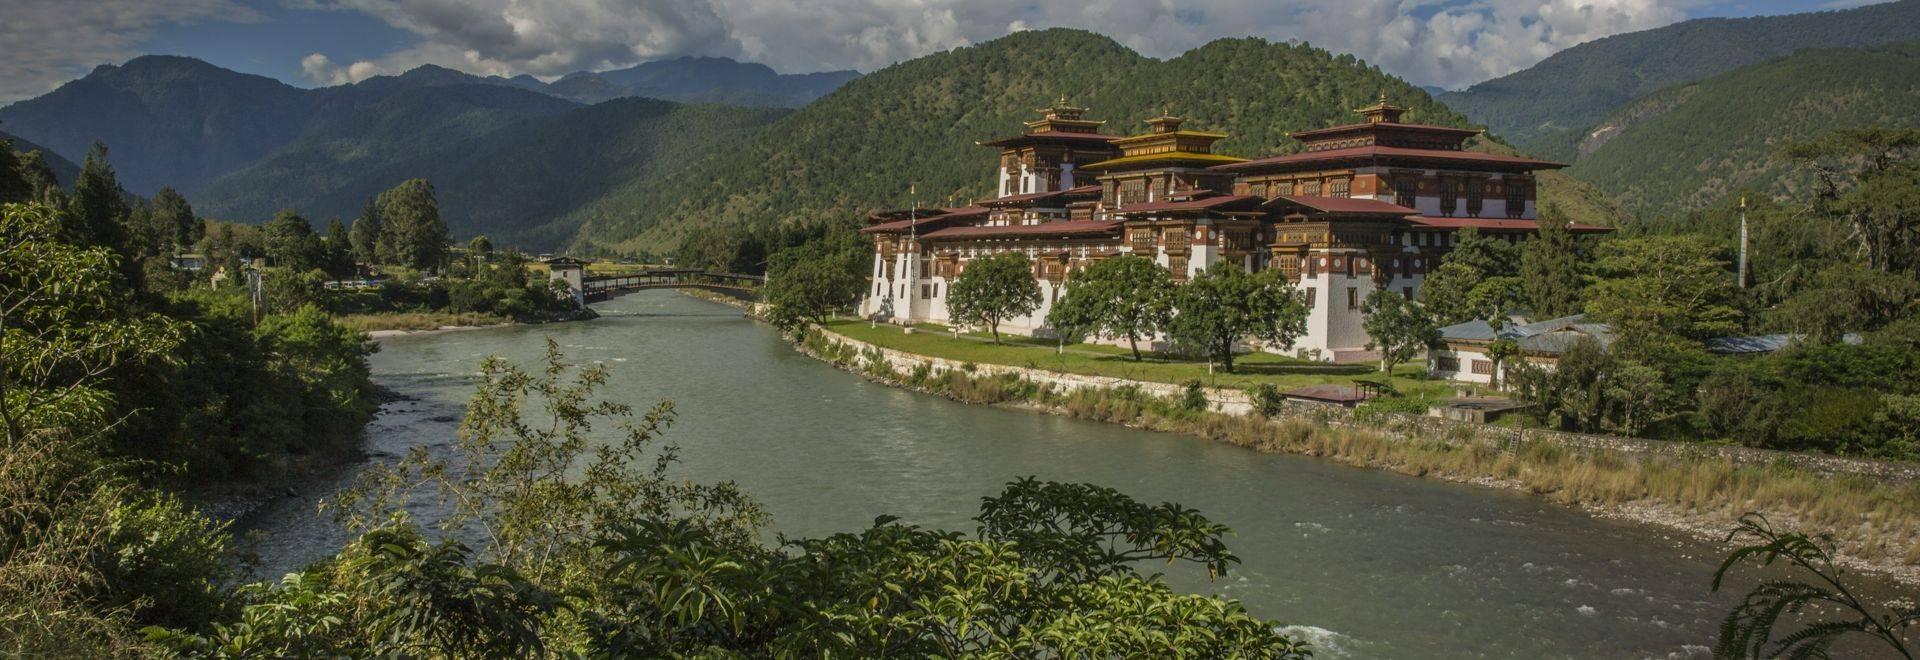 Bhutan Punakha Dzong Oana Dragan 2016 - 0M4A5846 Lg RGB.jpg